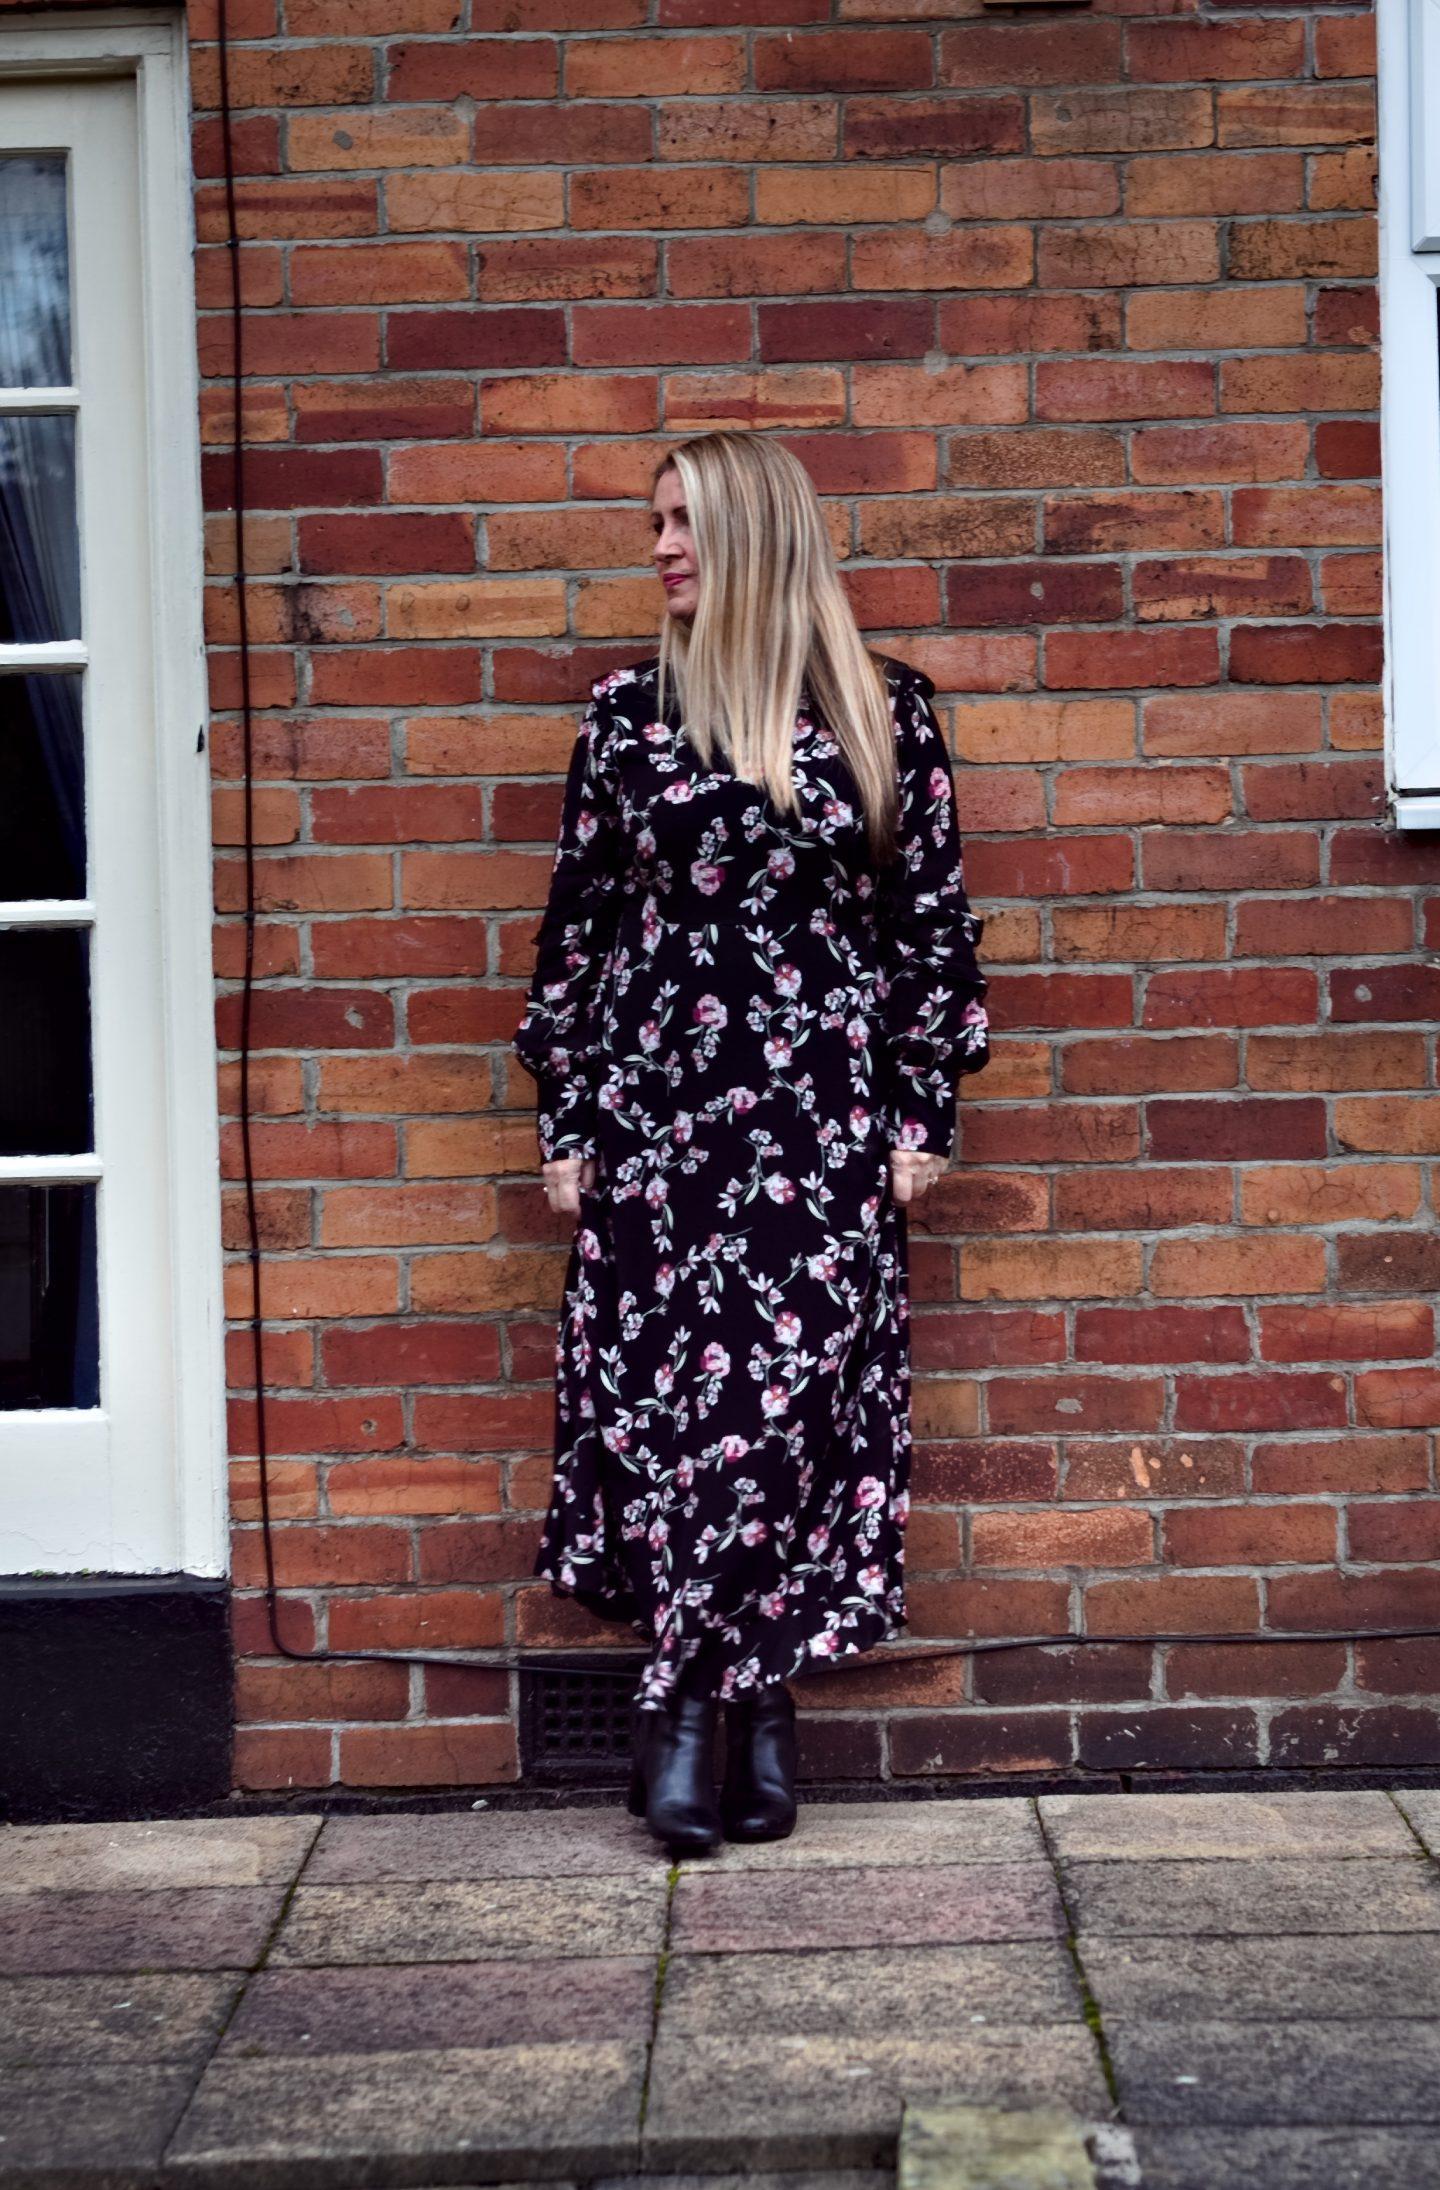 Nostalgia – A Tale of Three Dresses